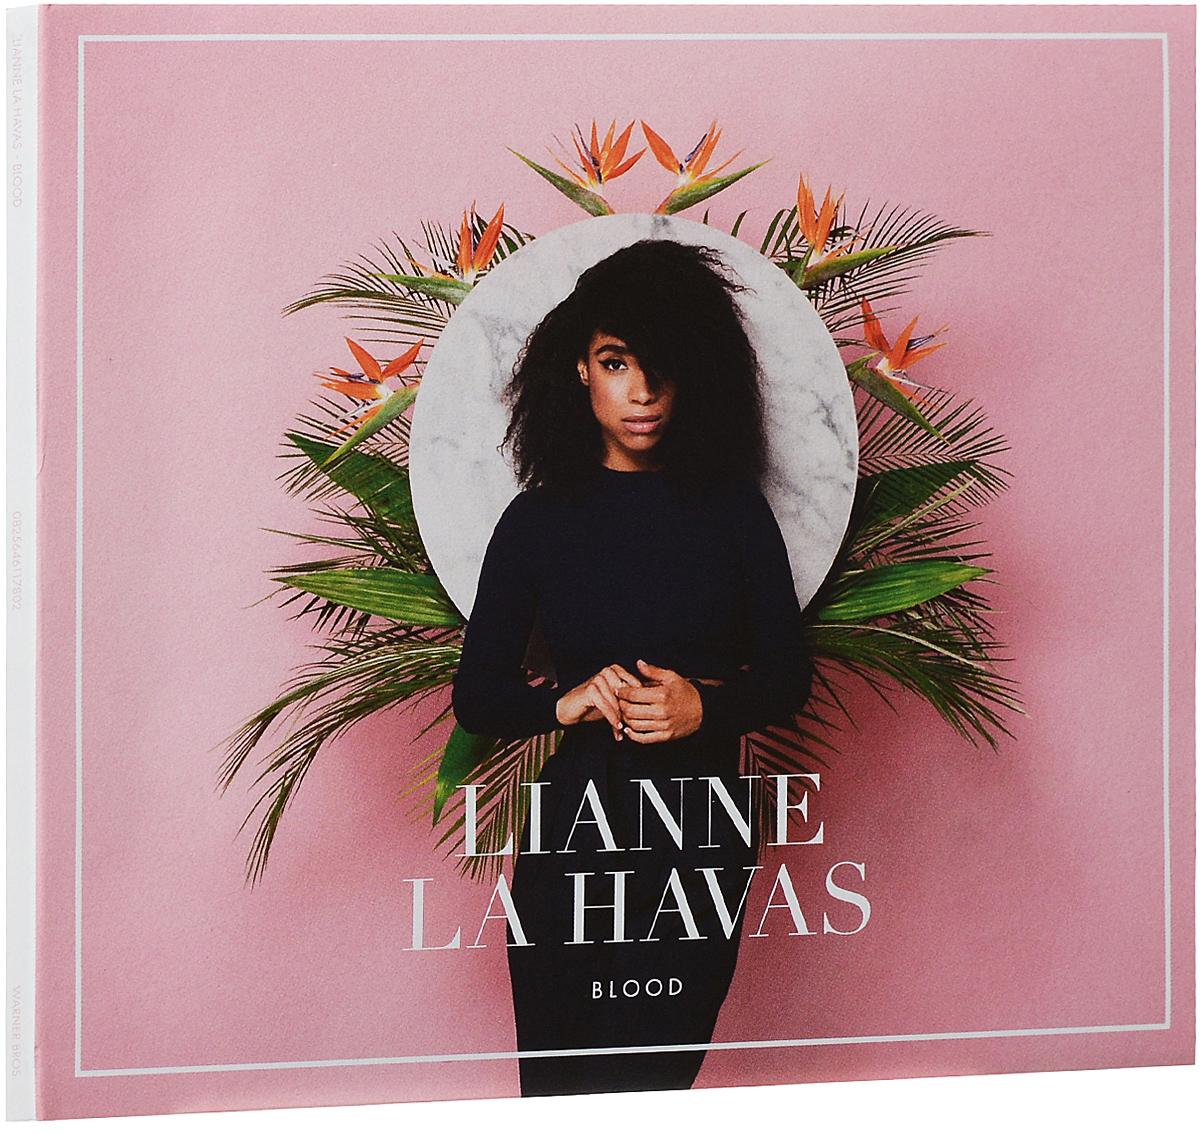 лучшая цена Лианн Ла Хавас Lianne La Havas. Blood